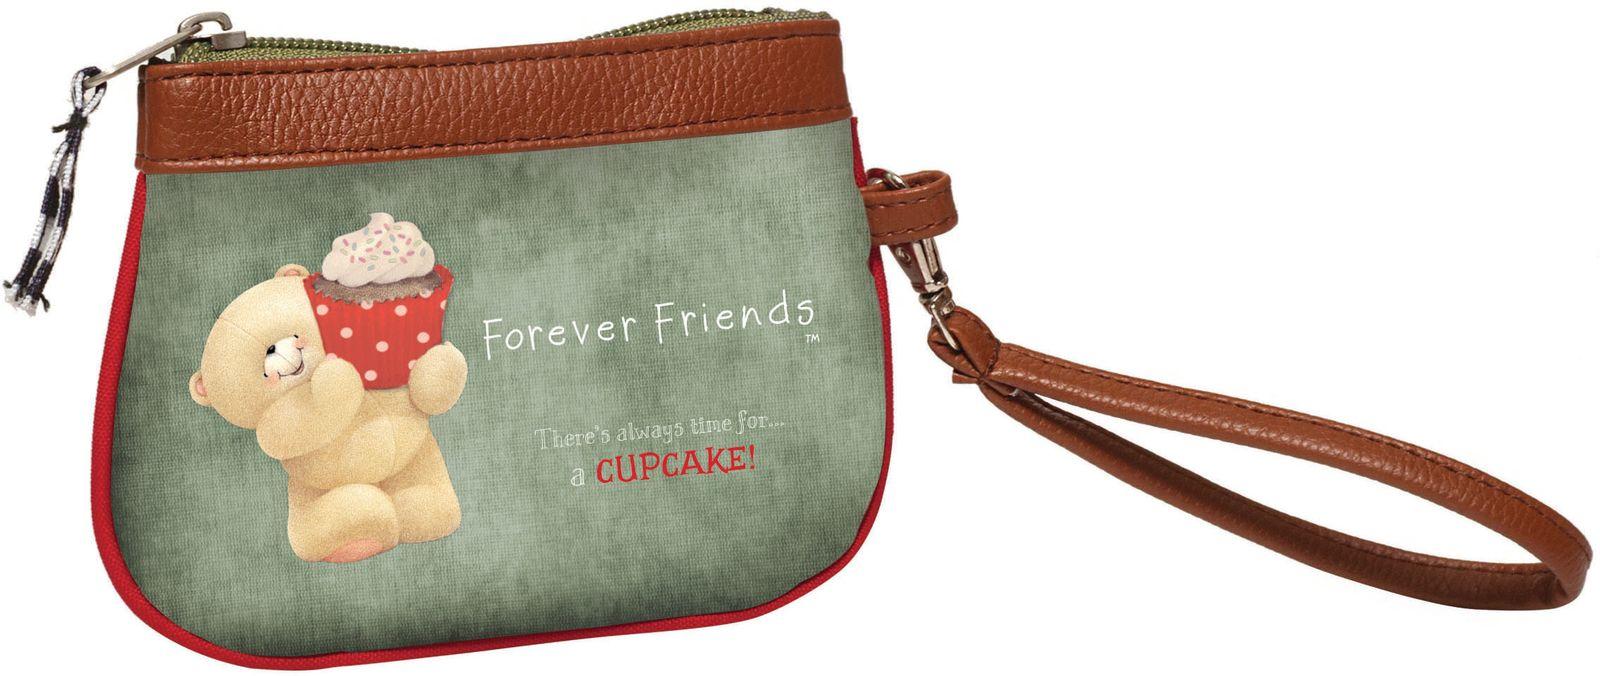 3b7e1eef47 Bagz Πορτοφόλι Μικρό Forever Friends Cupcakes BMU 333-41288